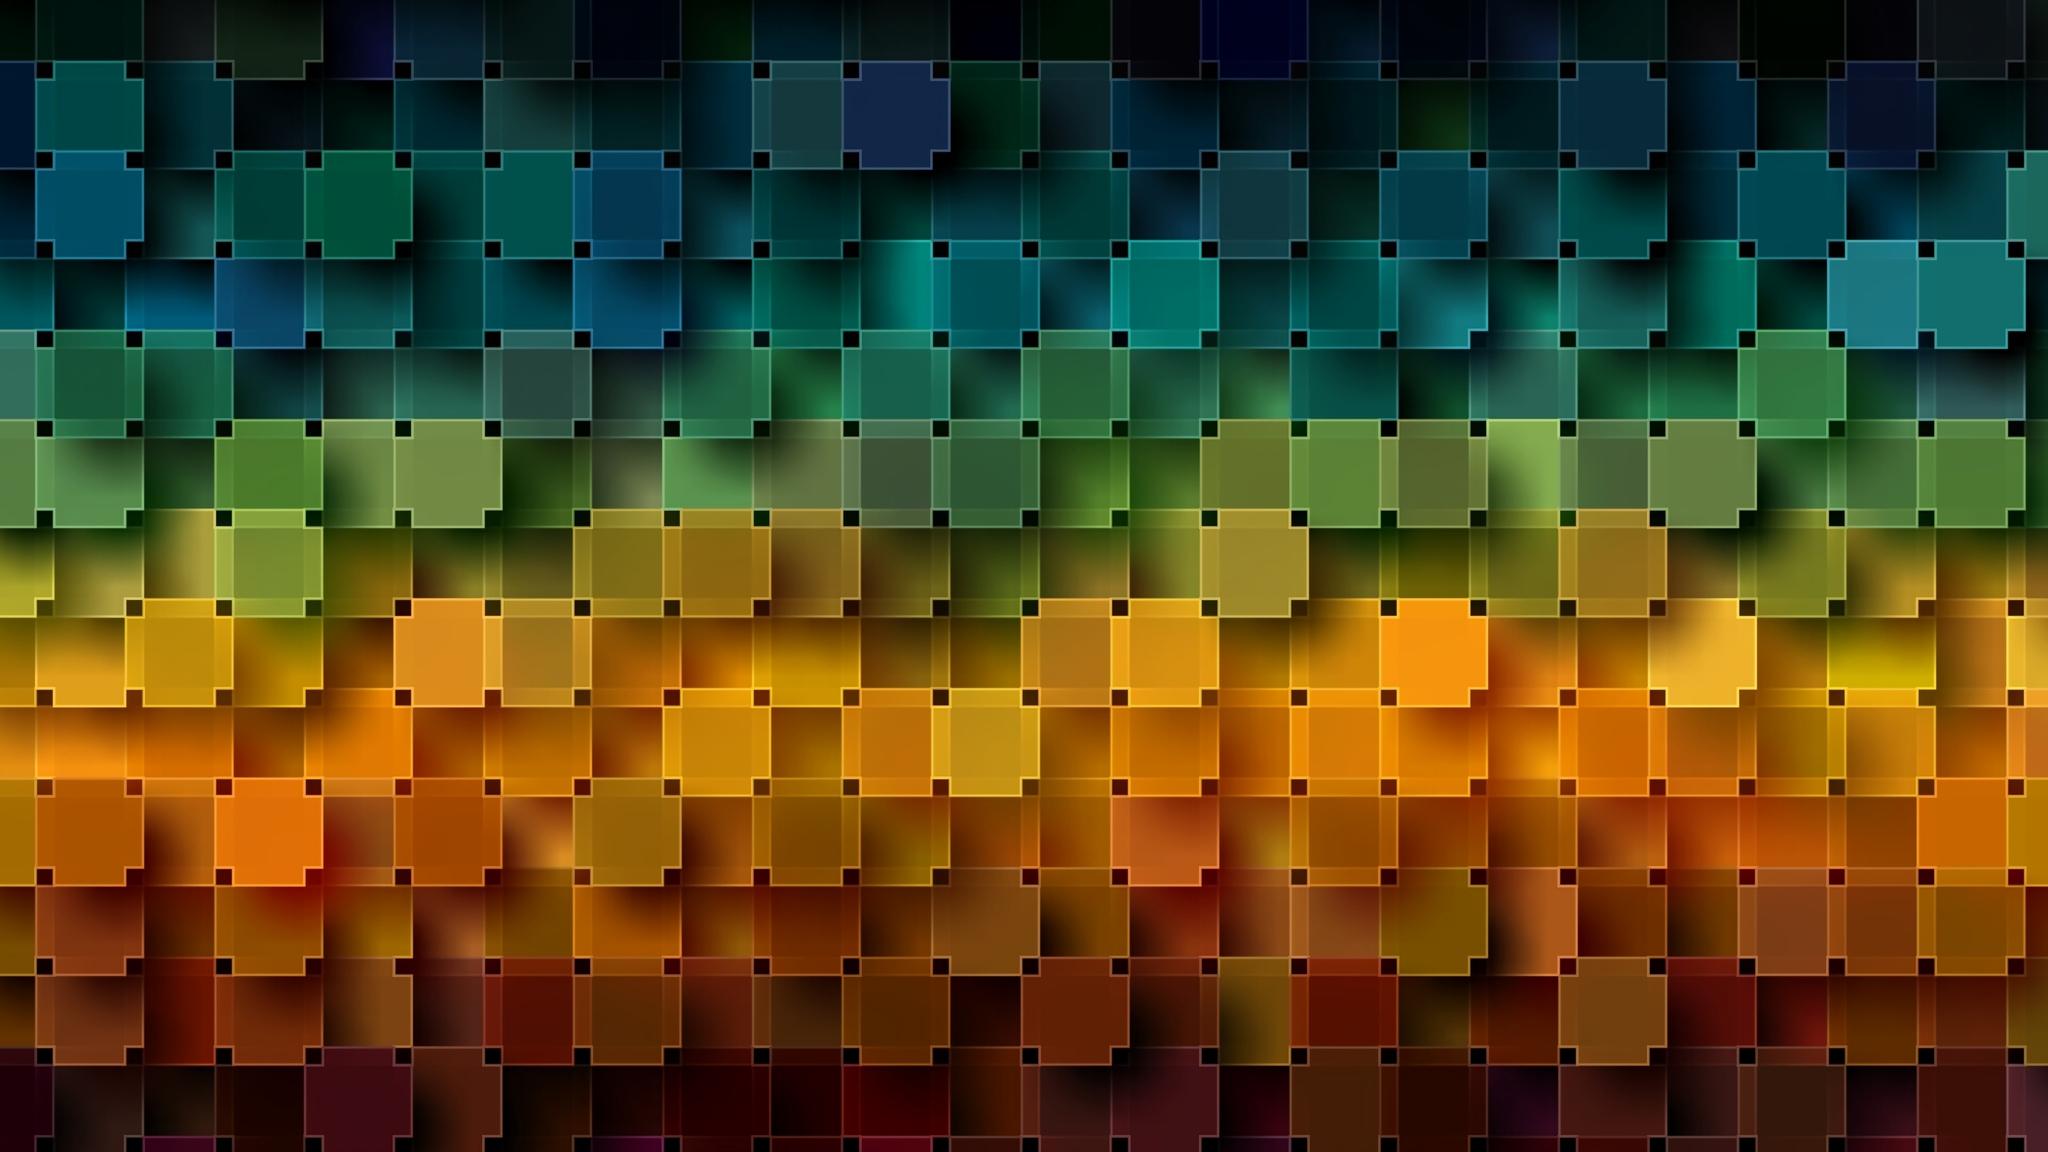 grid-pattern-abstract-digital-art-4k-ag.jpg